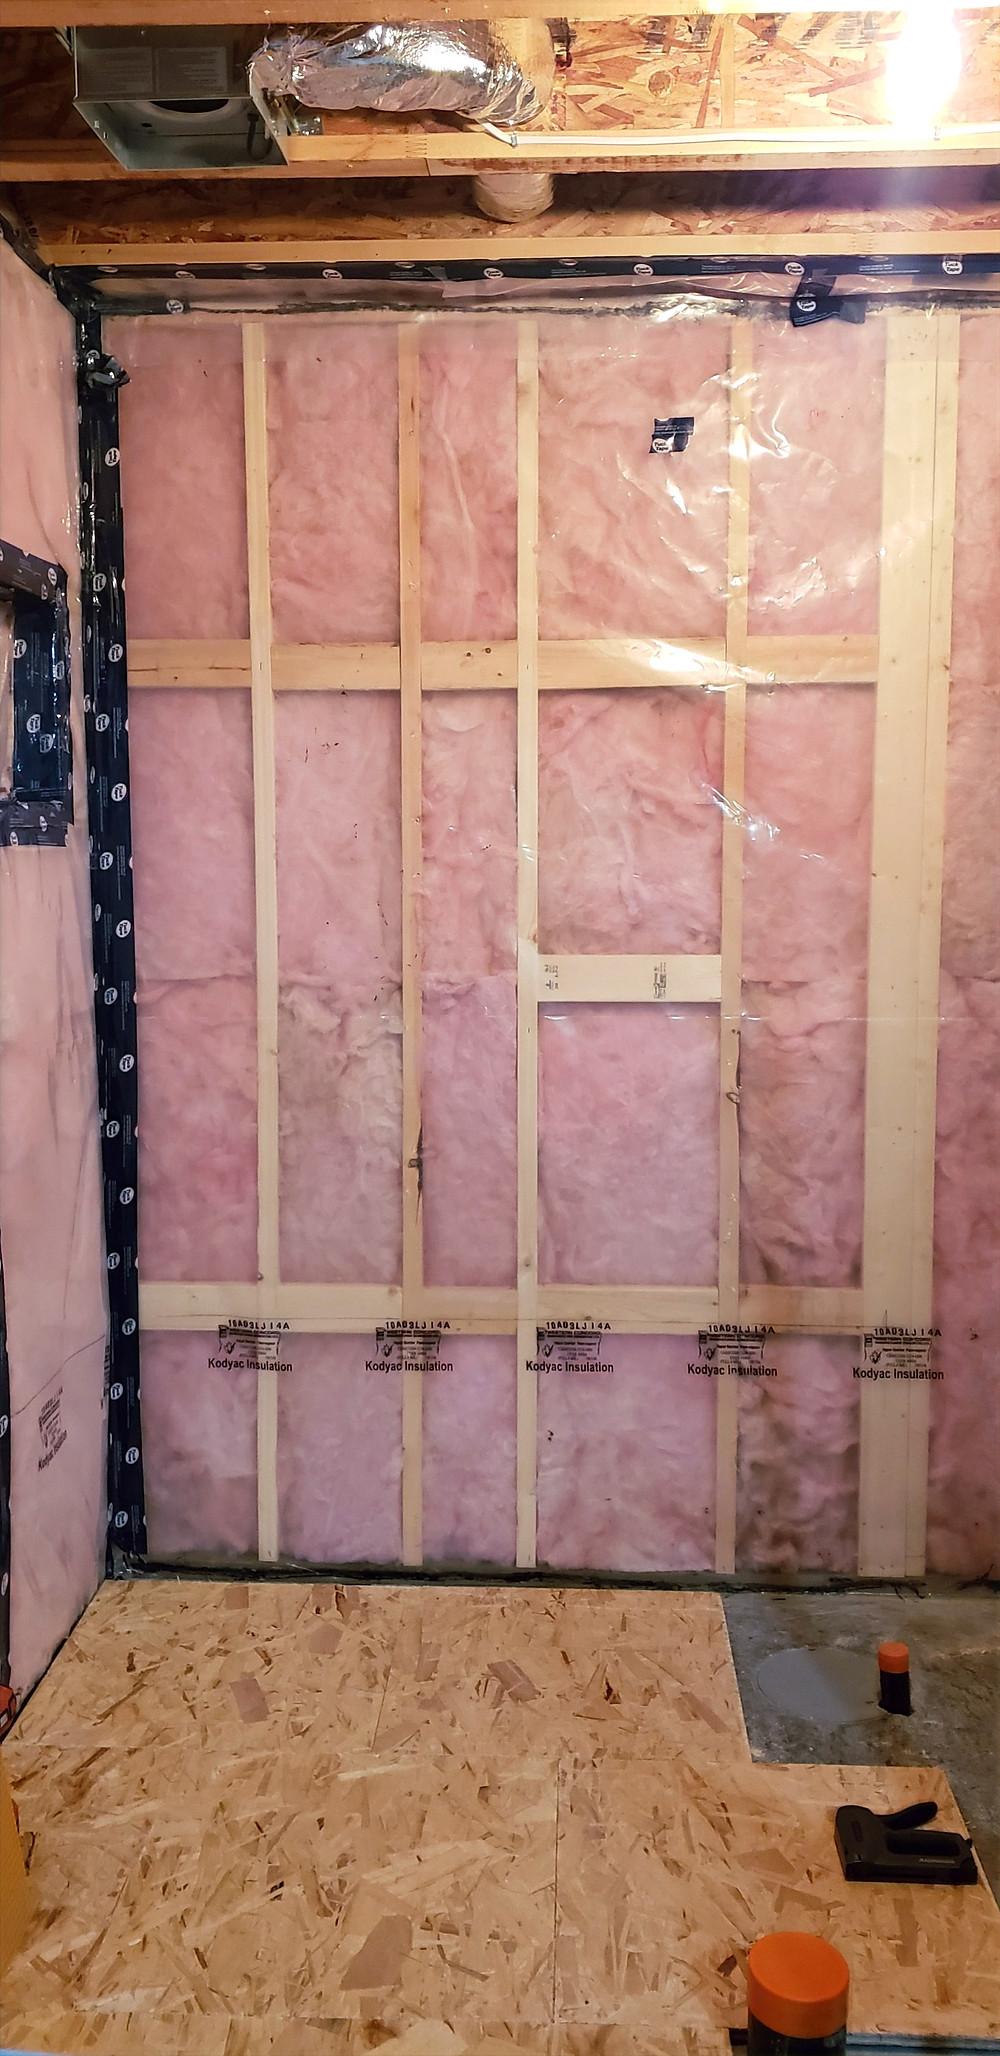 Basement development | rough-in plumbing | Dricore subfloor